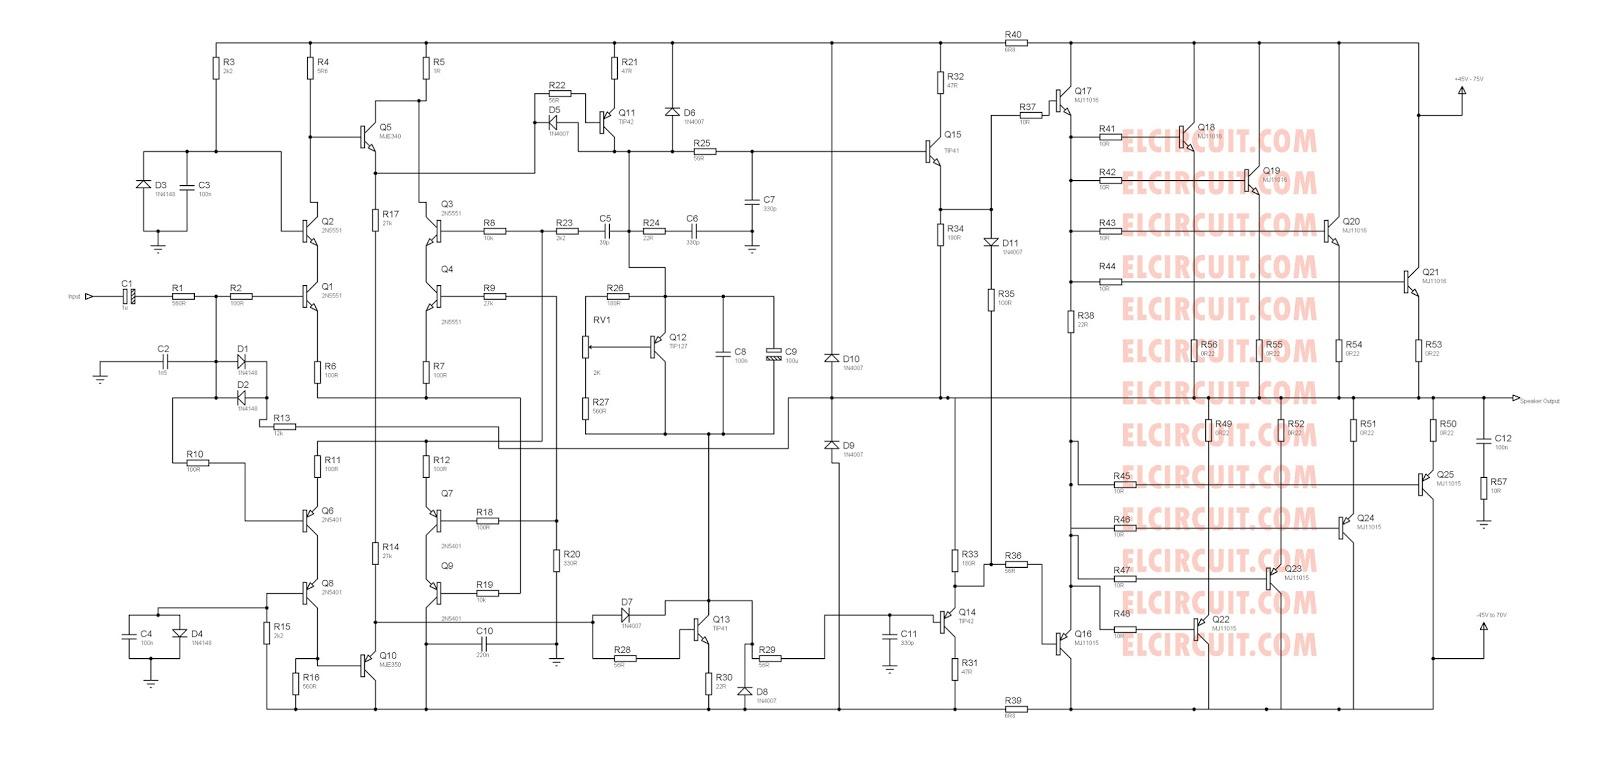 medium resolution of 2500w power amp cct diagrams wiring library 2500w power amp cct diagrams